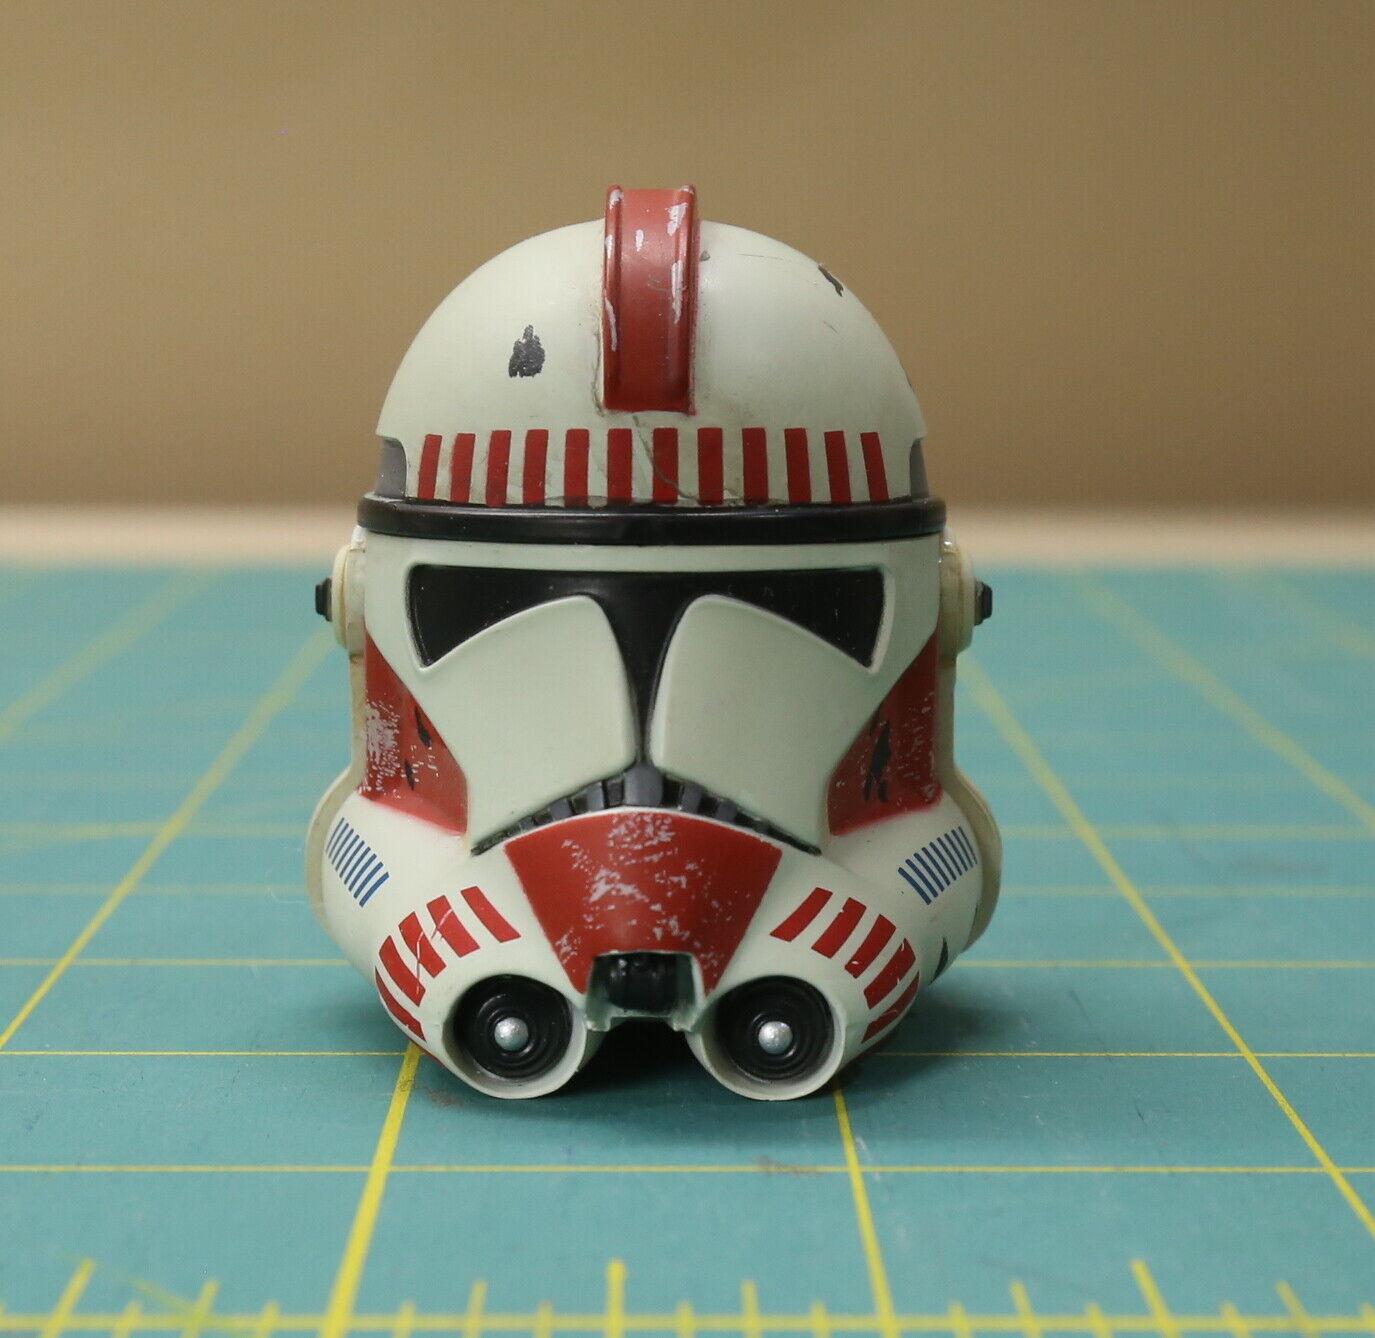 Sideshow 1/6 Scale Imperial Shock Trooper Phase II Helmet on eBay thumbnail